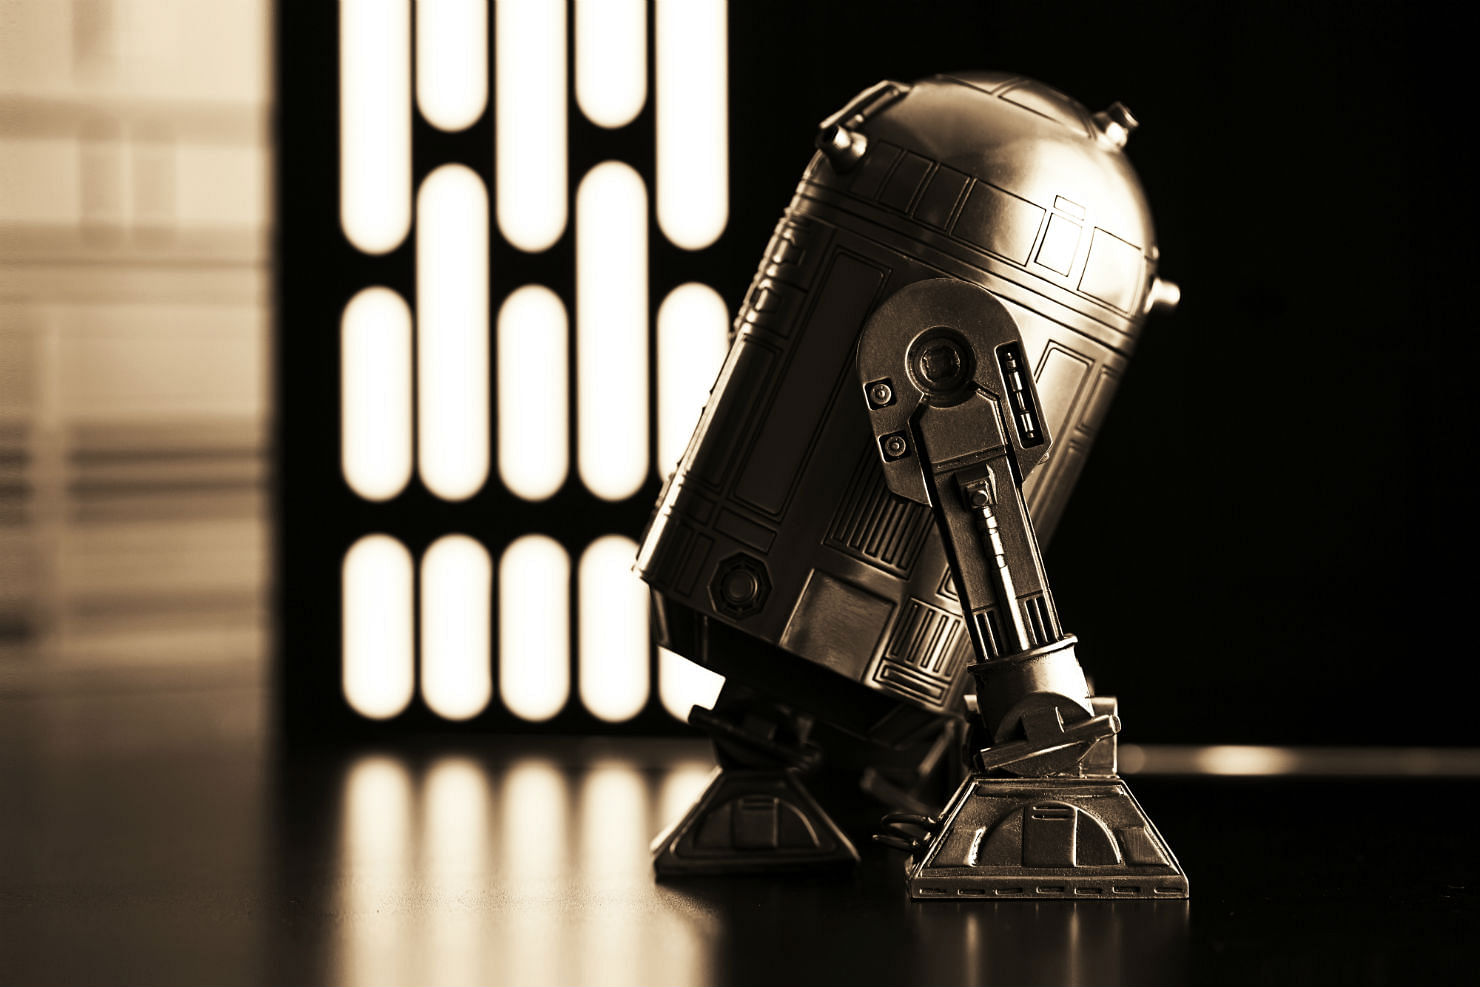 Star Wars R2D2 tea canister Royal Selangor